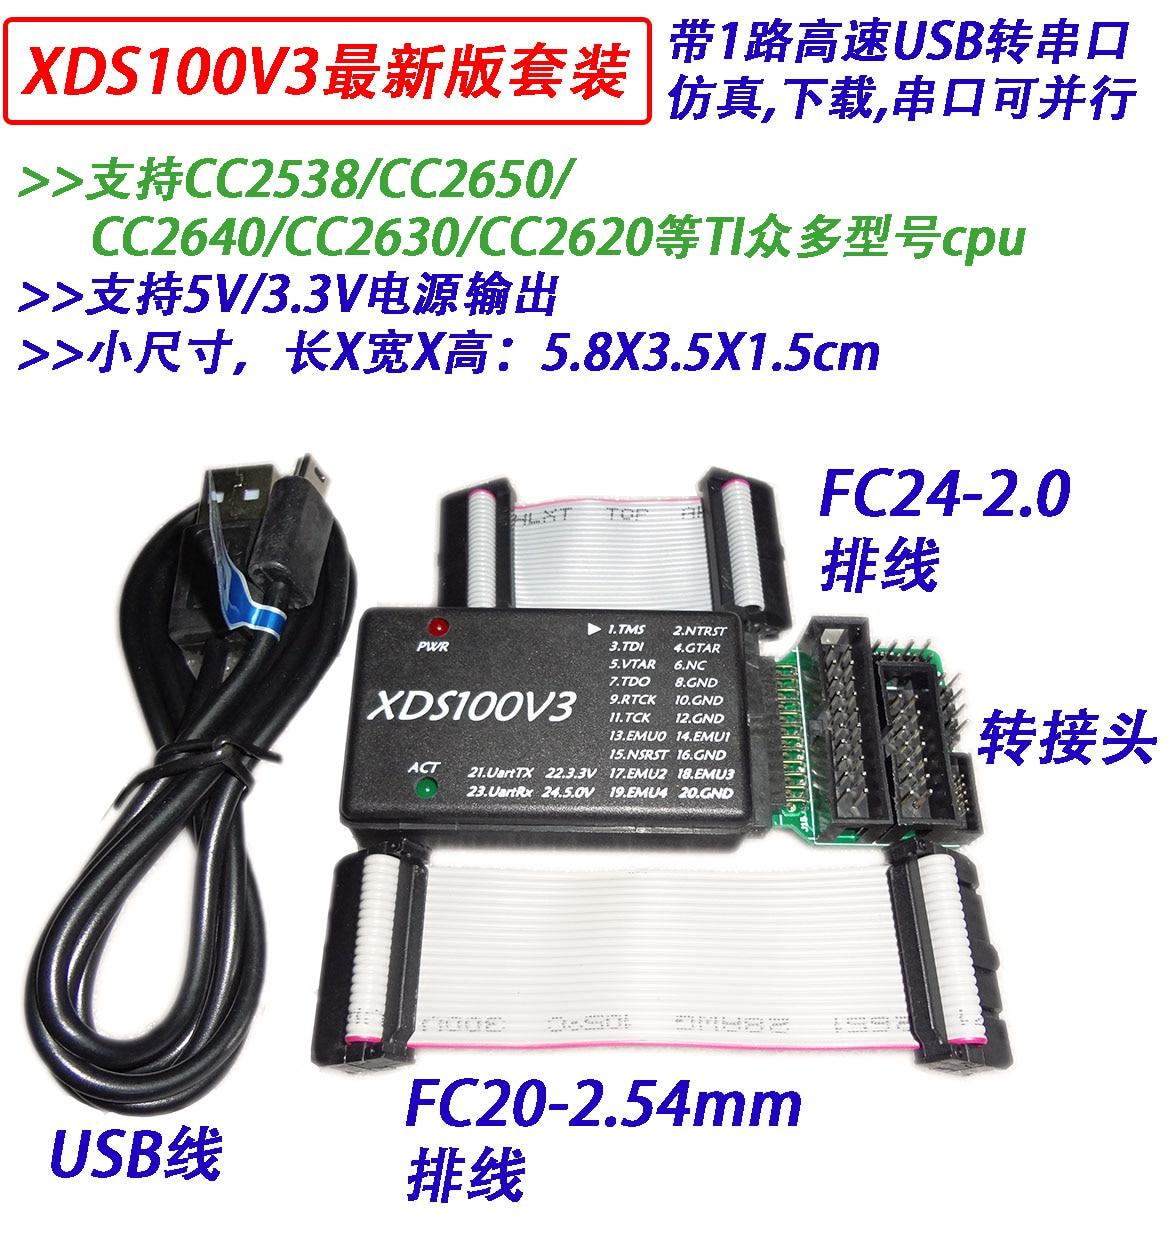 цена на XDS100V3 simulator, CC2538, CC2650, CC2640 special simulator